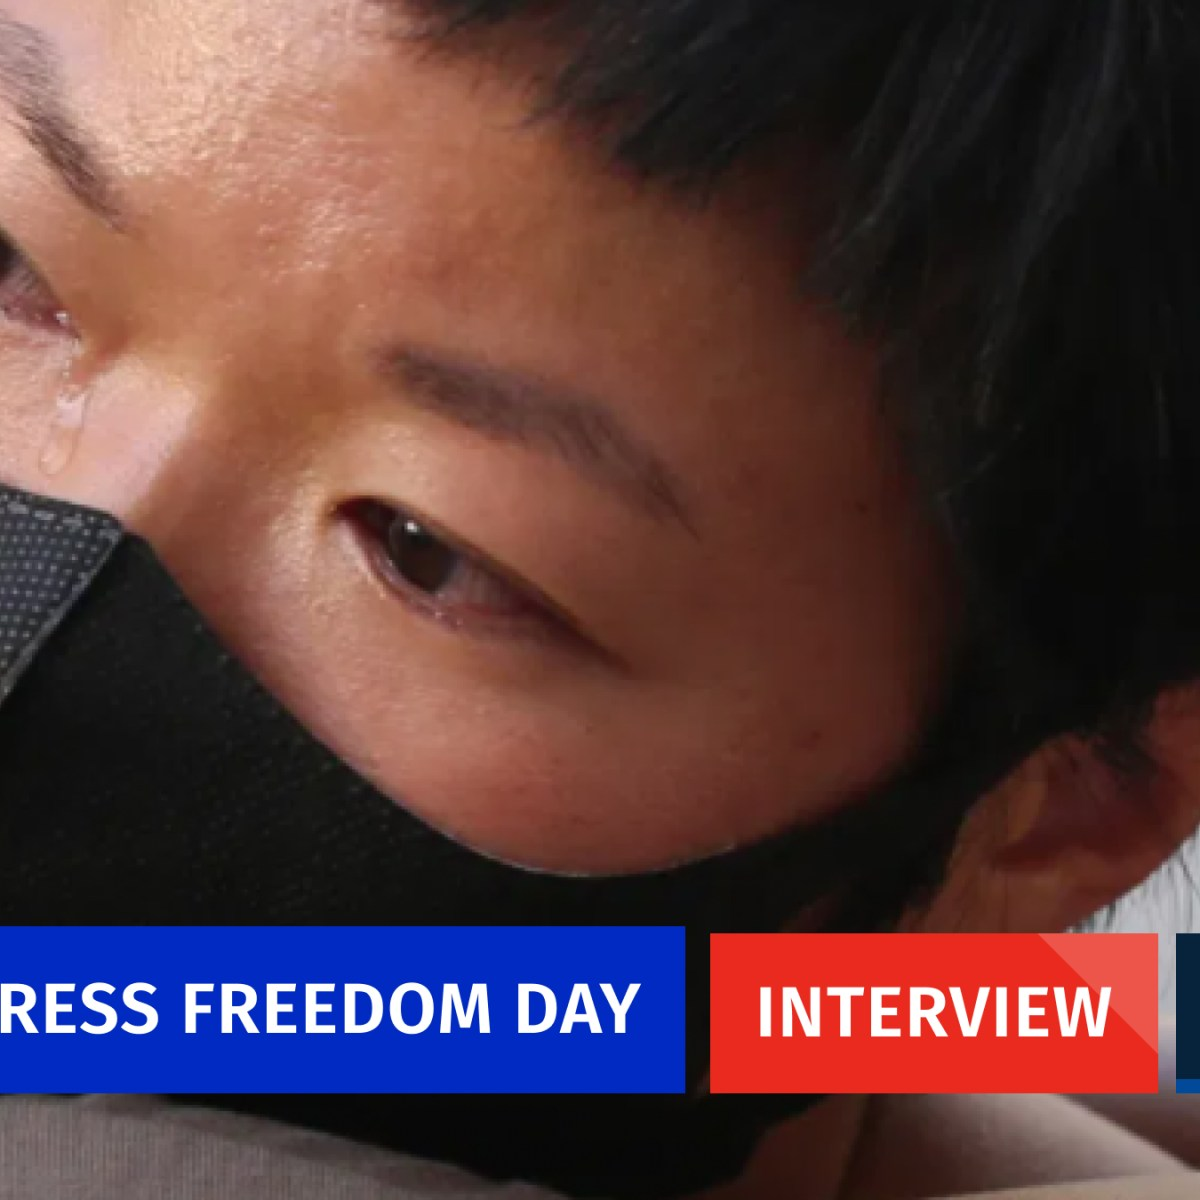 bao choy interview